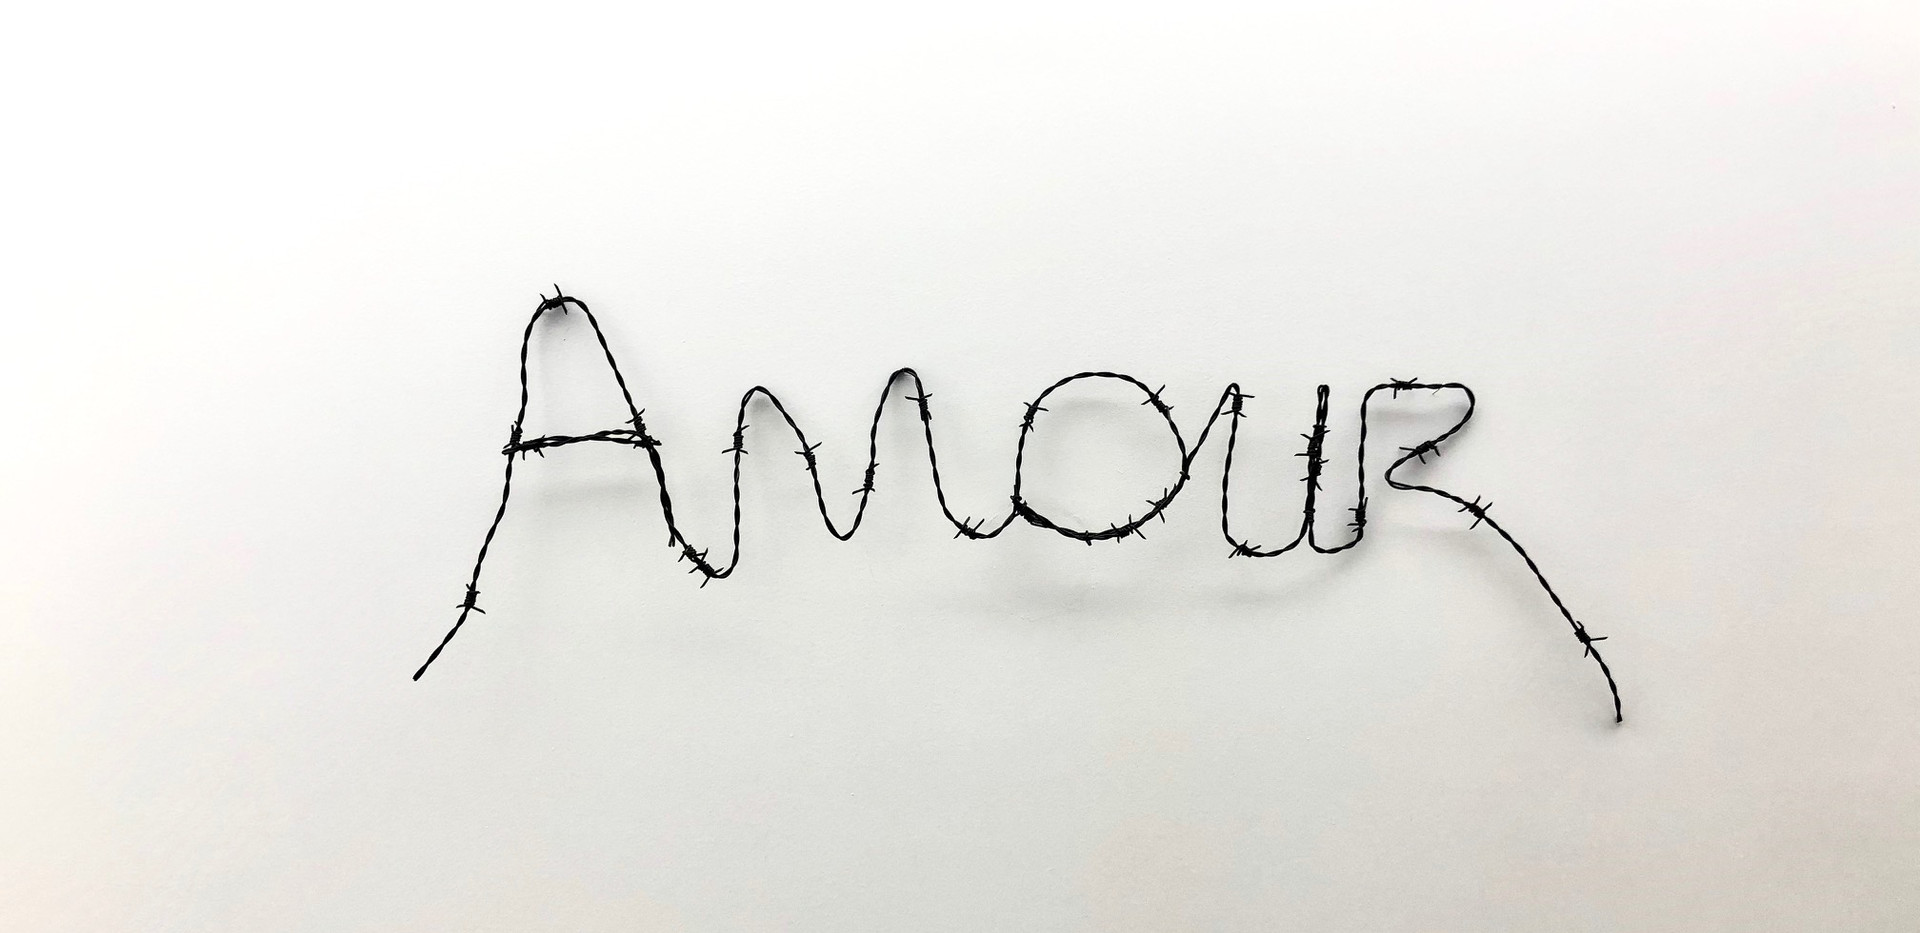 Dimitri Fagbohoun, Amour 1, 2020, fil de fer barbelé peint, 76 x 22 cm